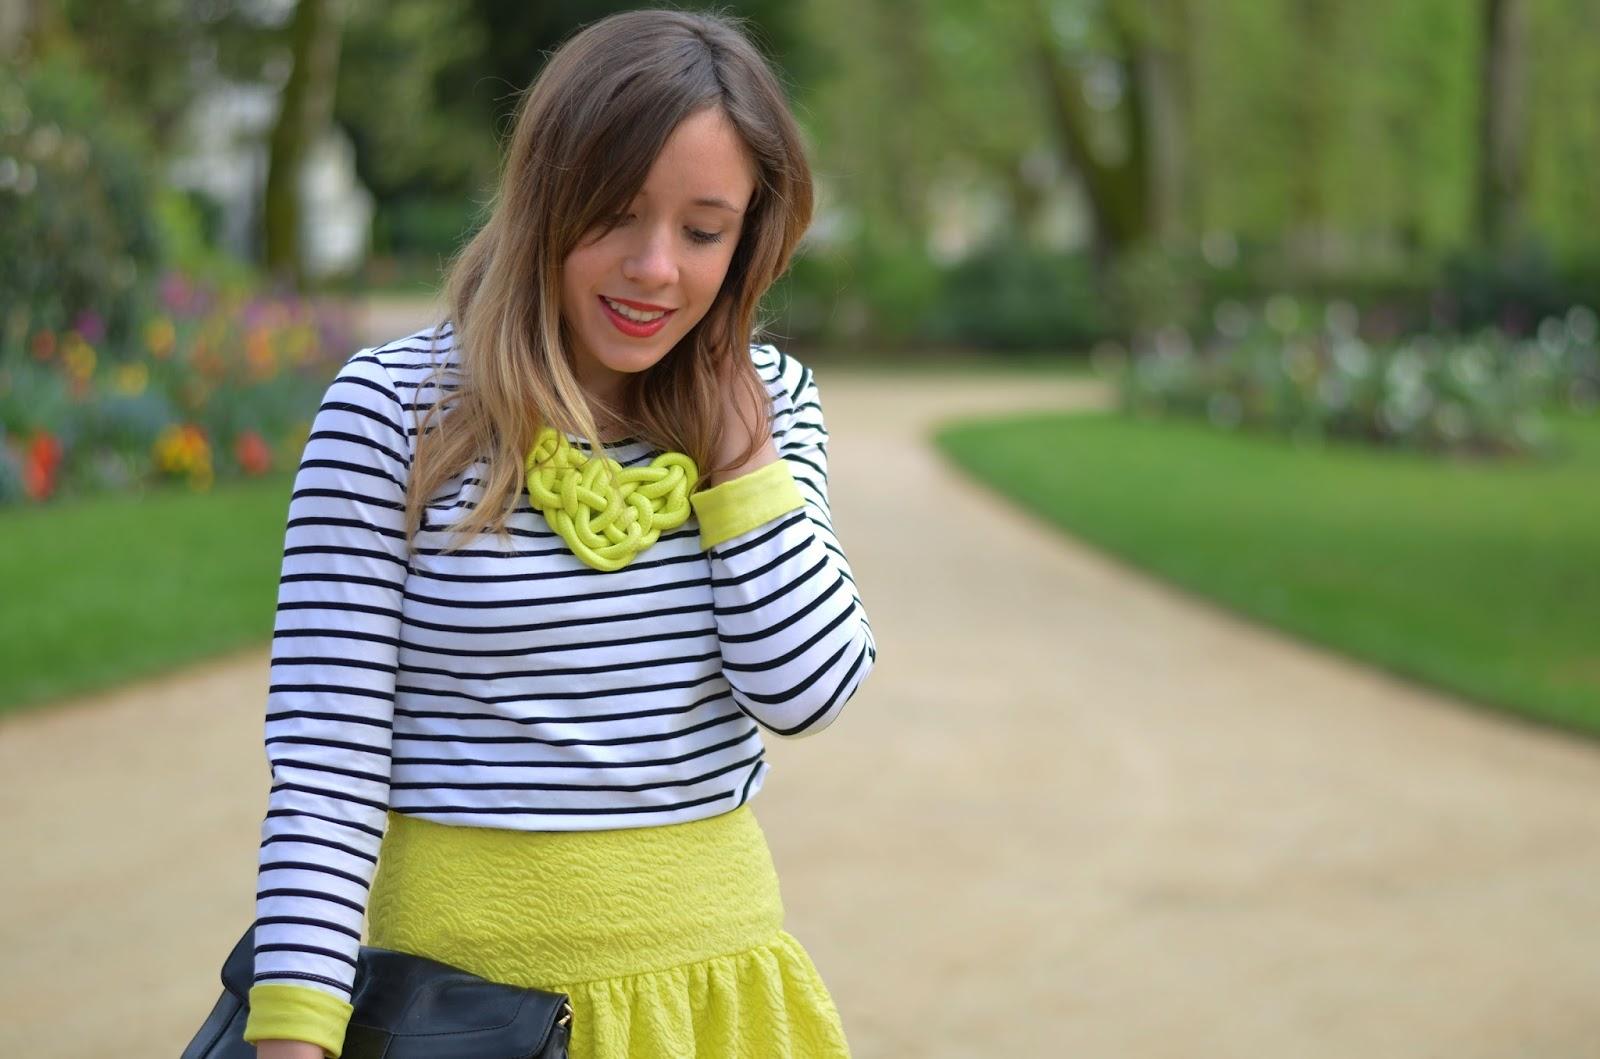 tendance mode jaune fluo